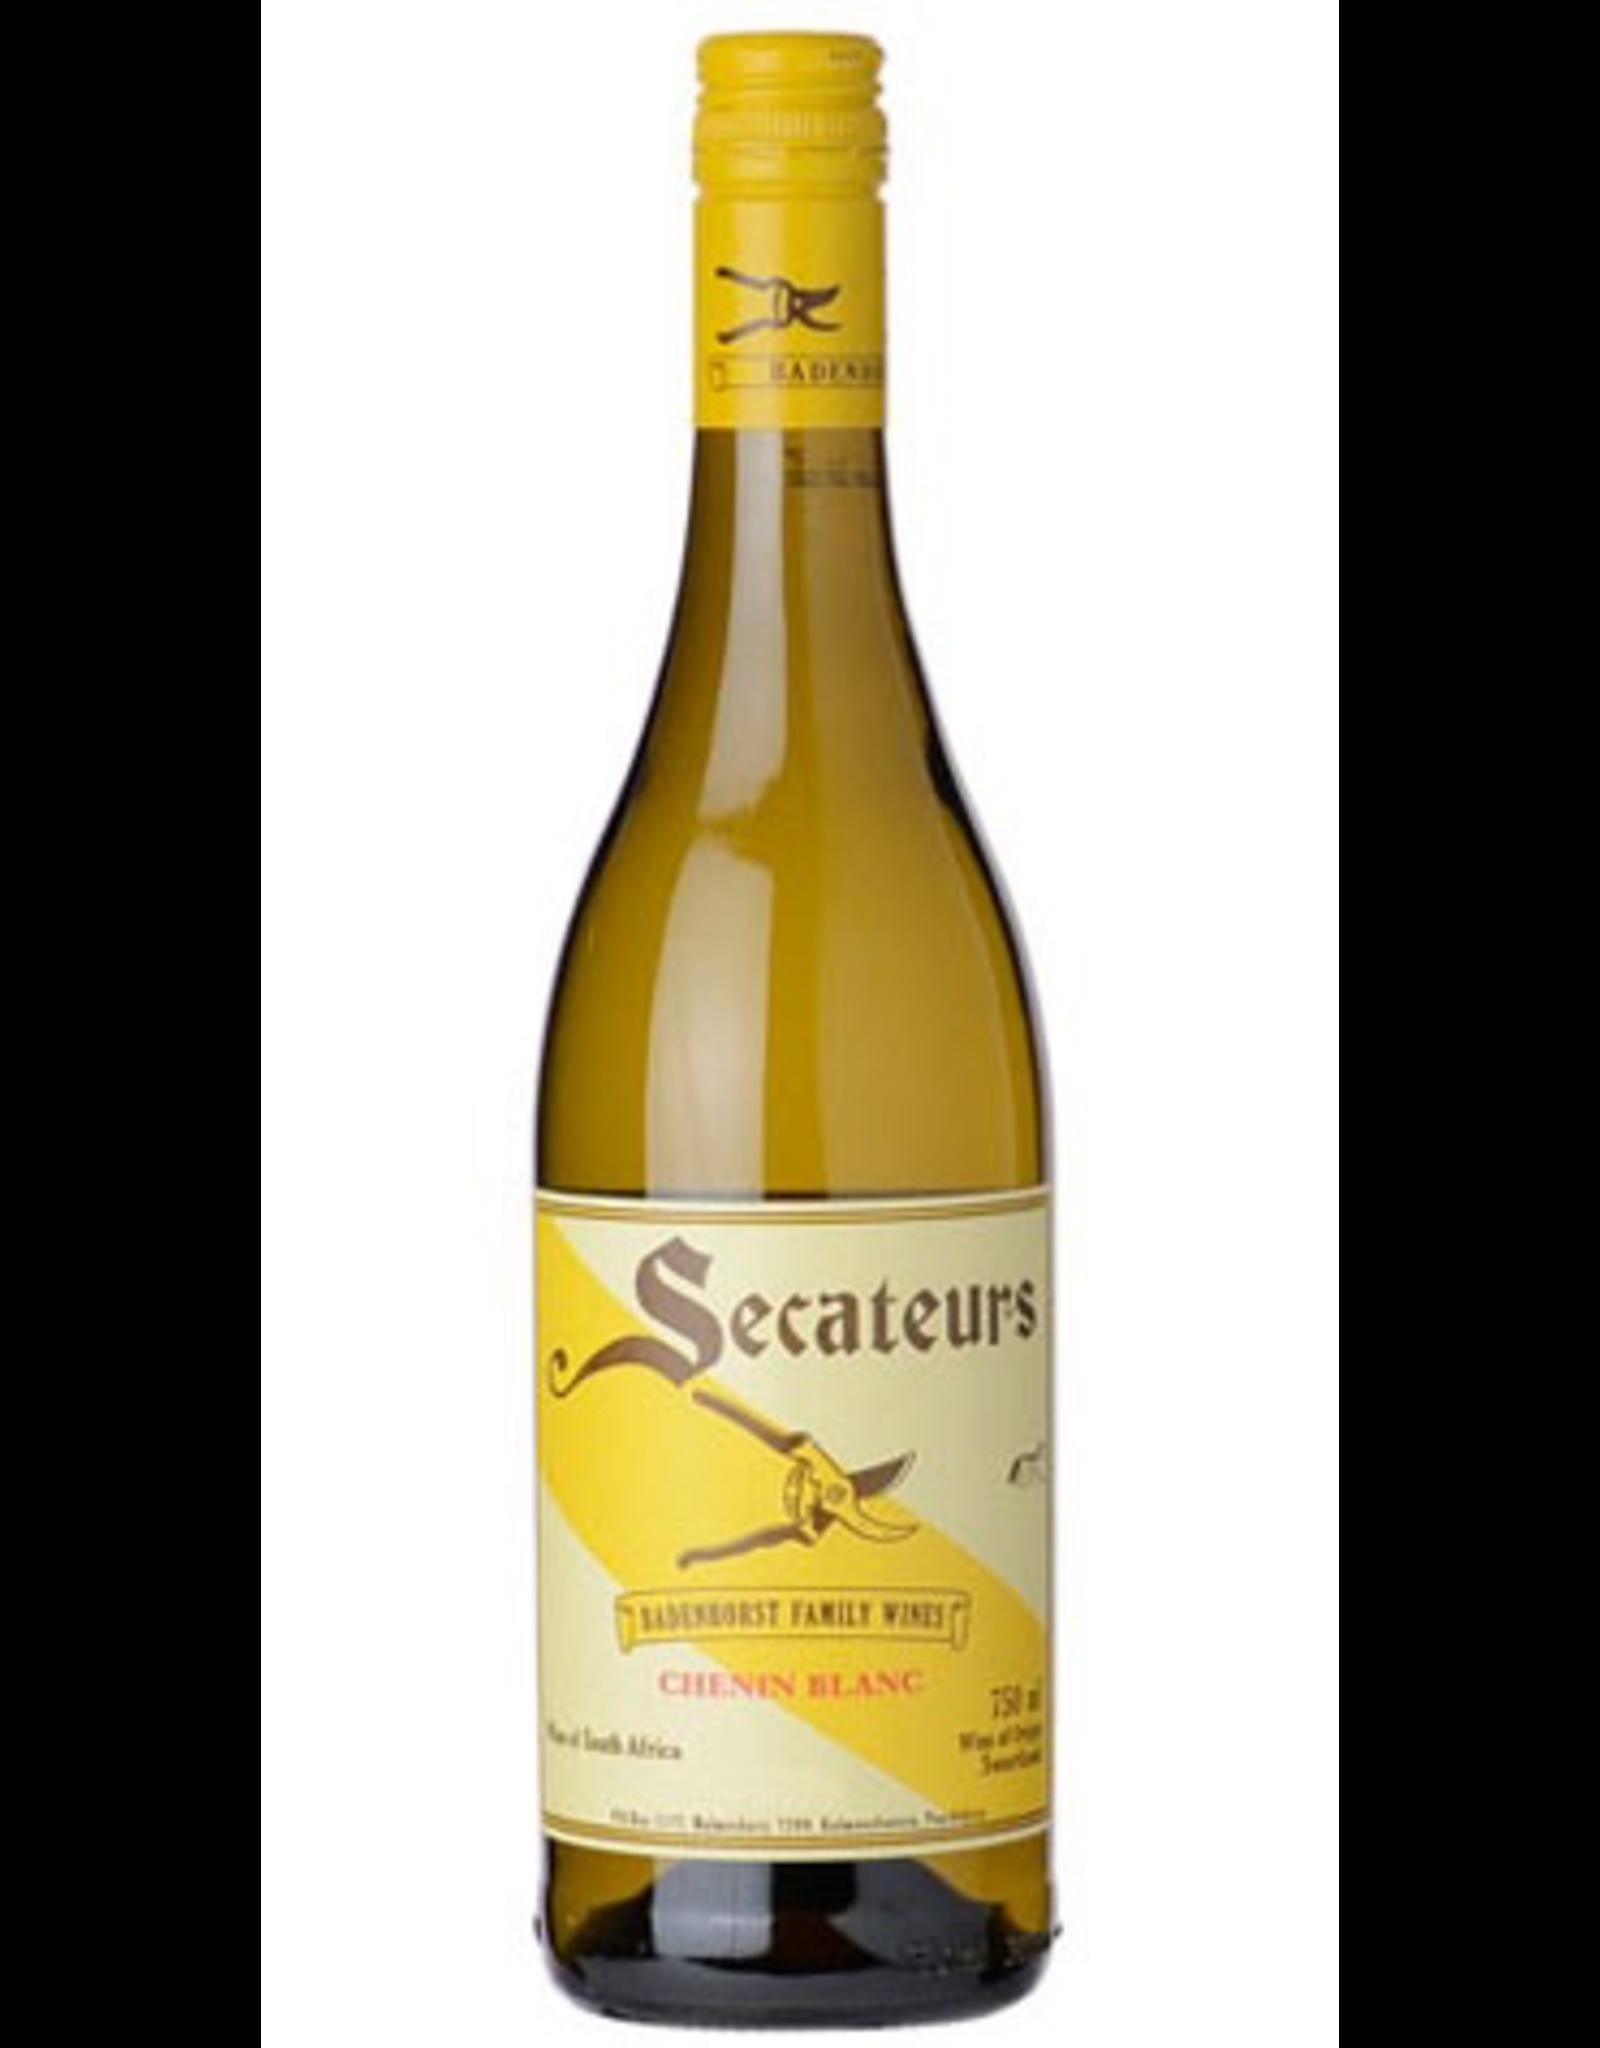 White Wine 2017, A.A. Badenhorst Family Wines Secateurs, Chenin Blanc, Swartland, Coastal Region, South Africa, 13.5% Alc, CT88, TW92